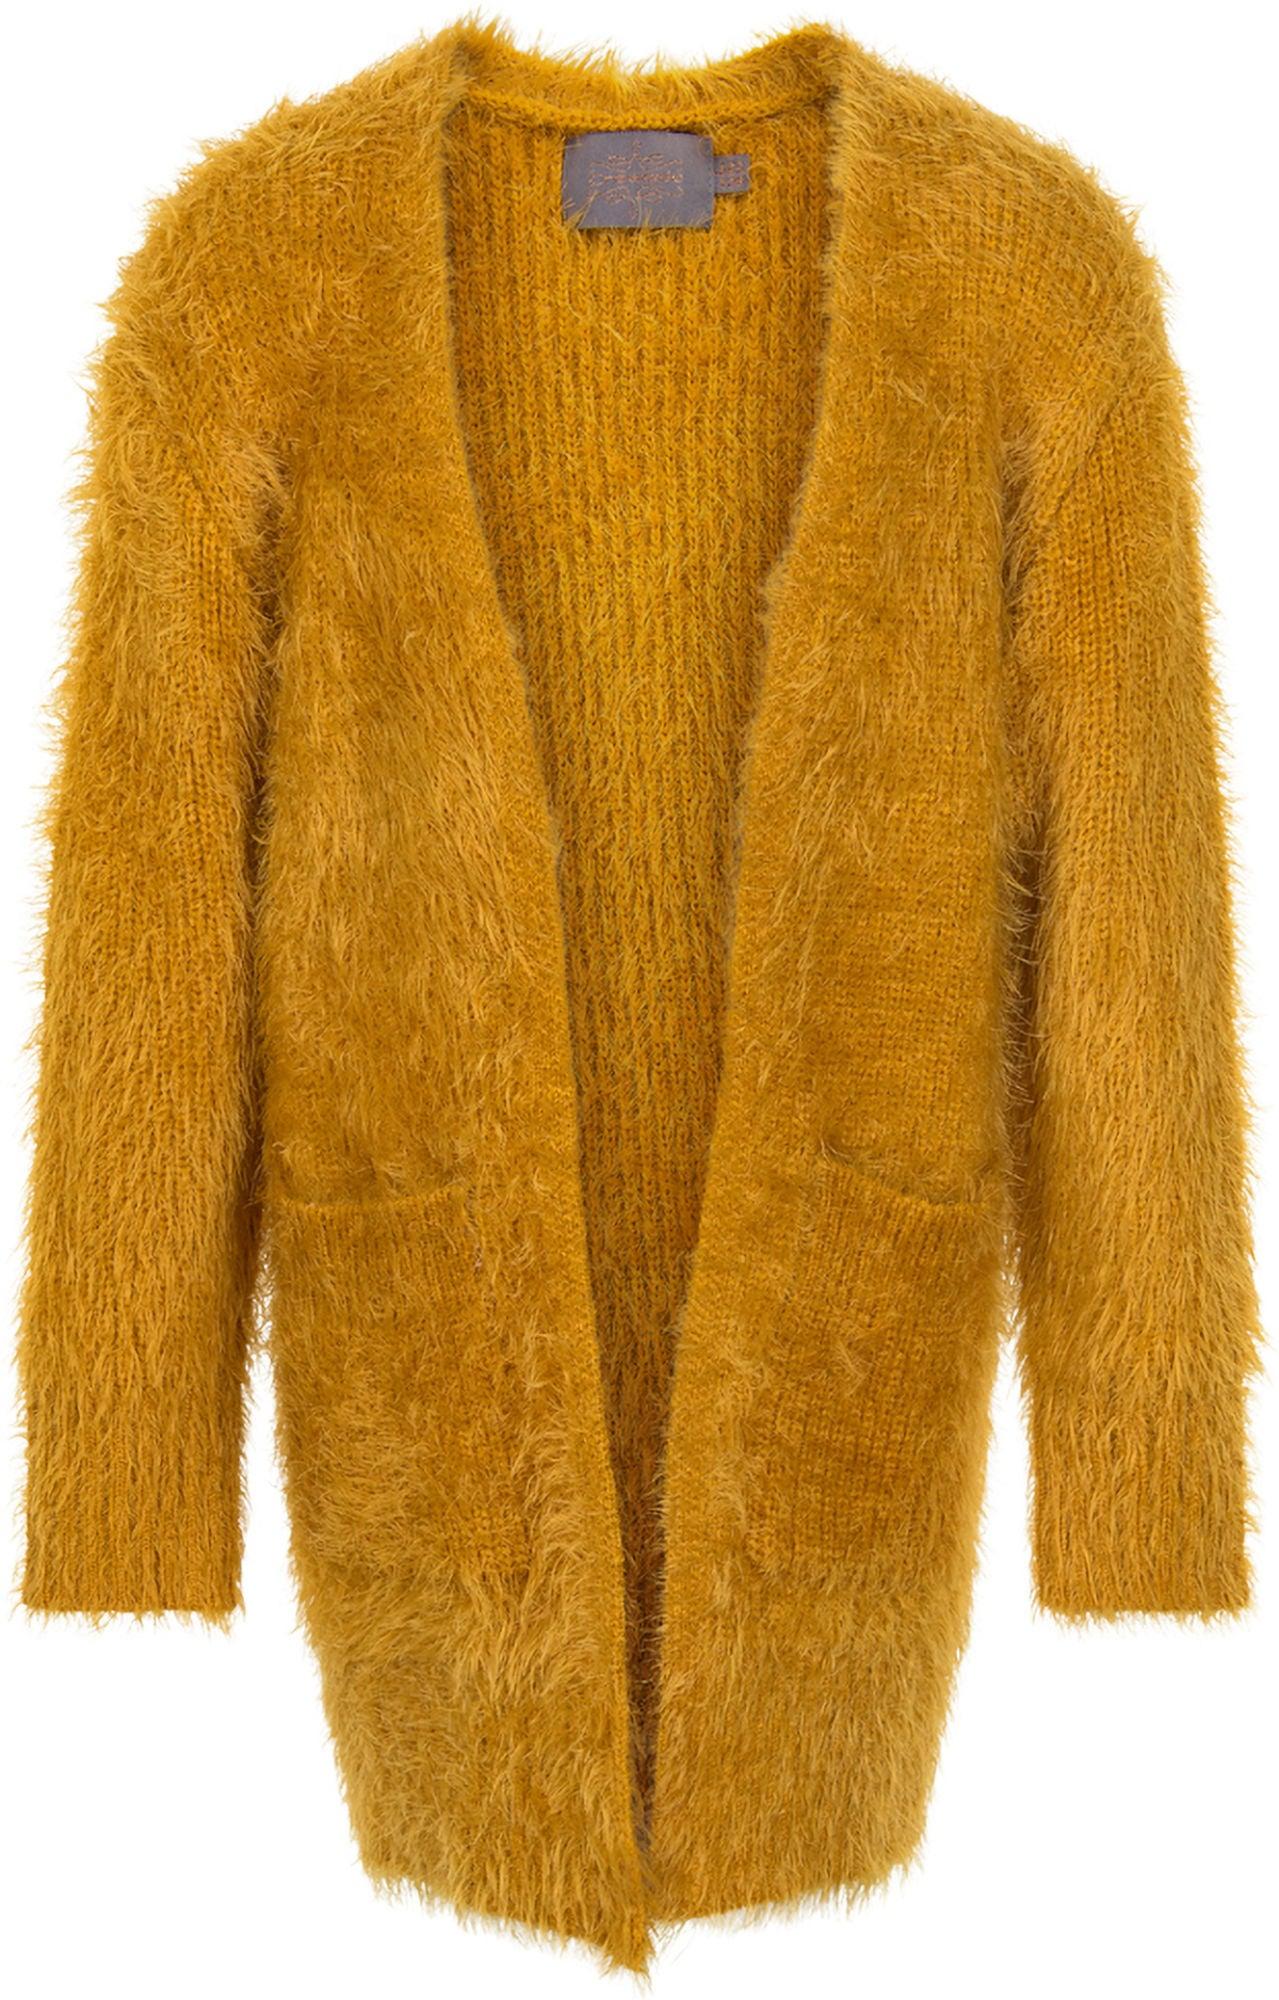 Creamie Cardigan, Harvest Gold 104-110